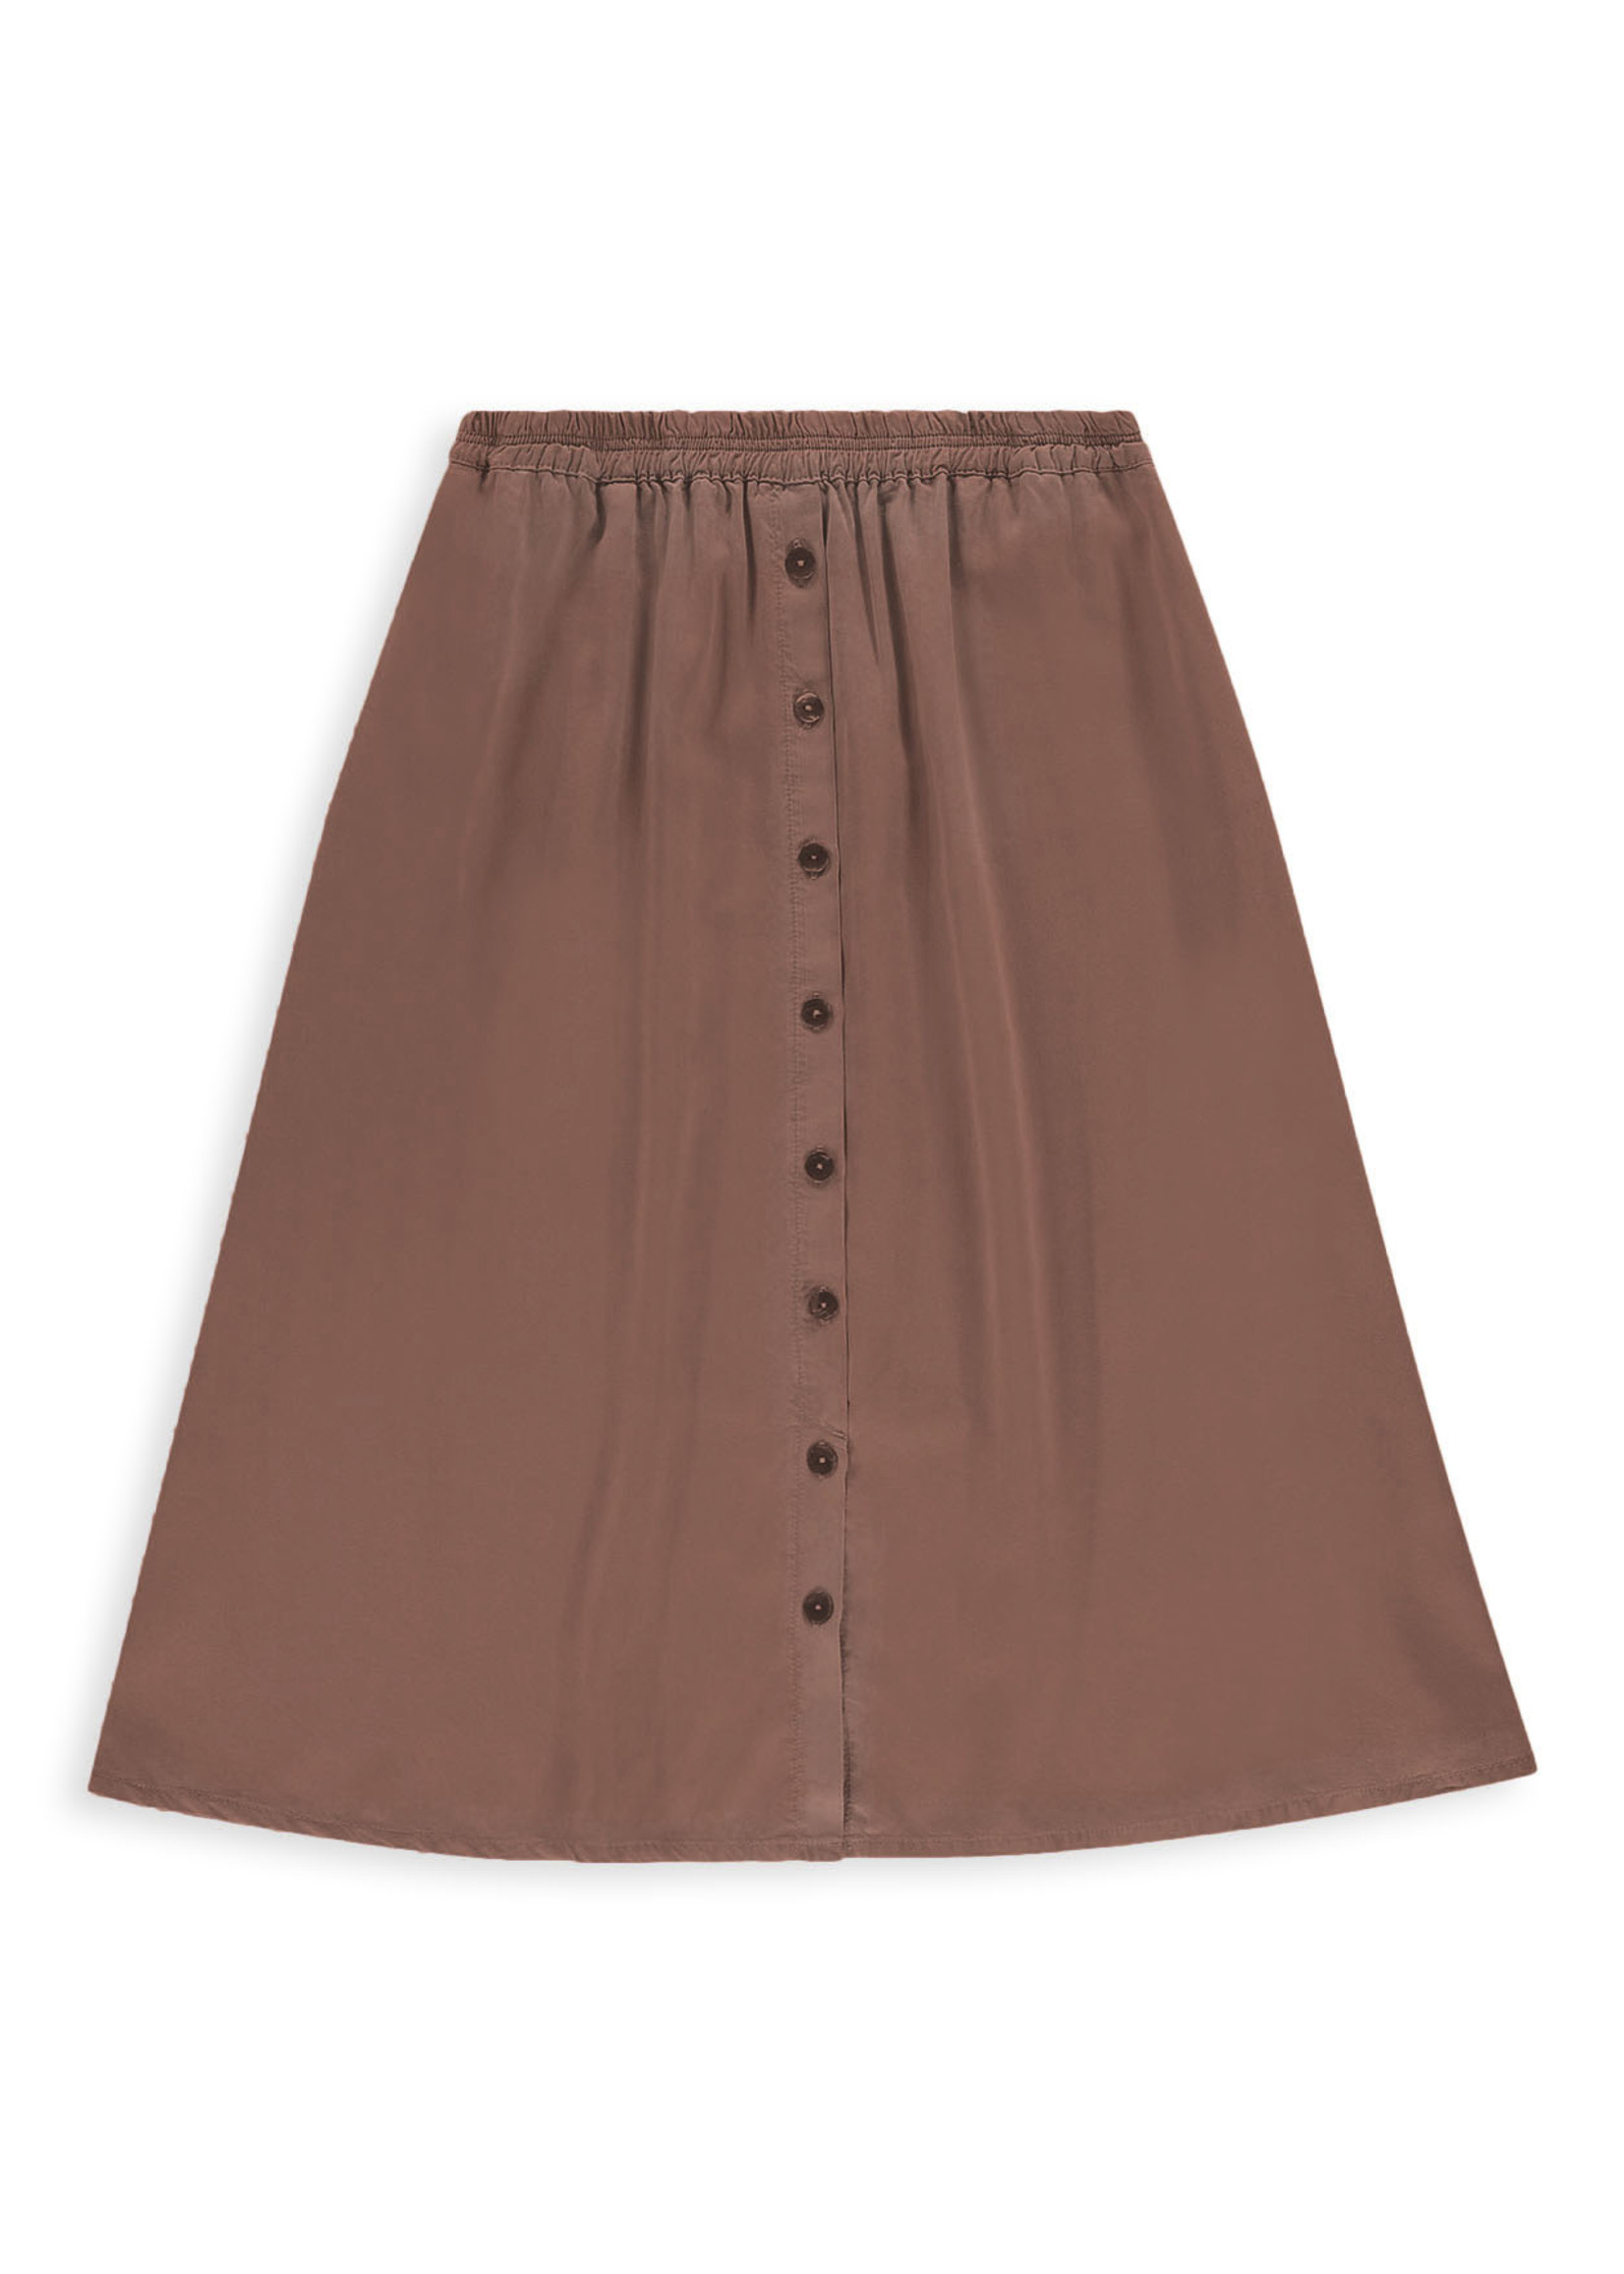 Alchemist Bay Skirt